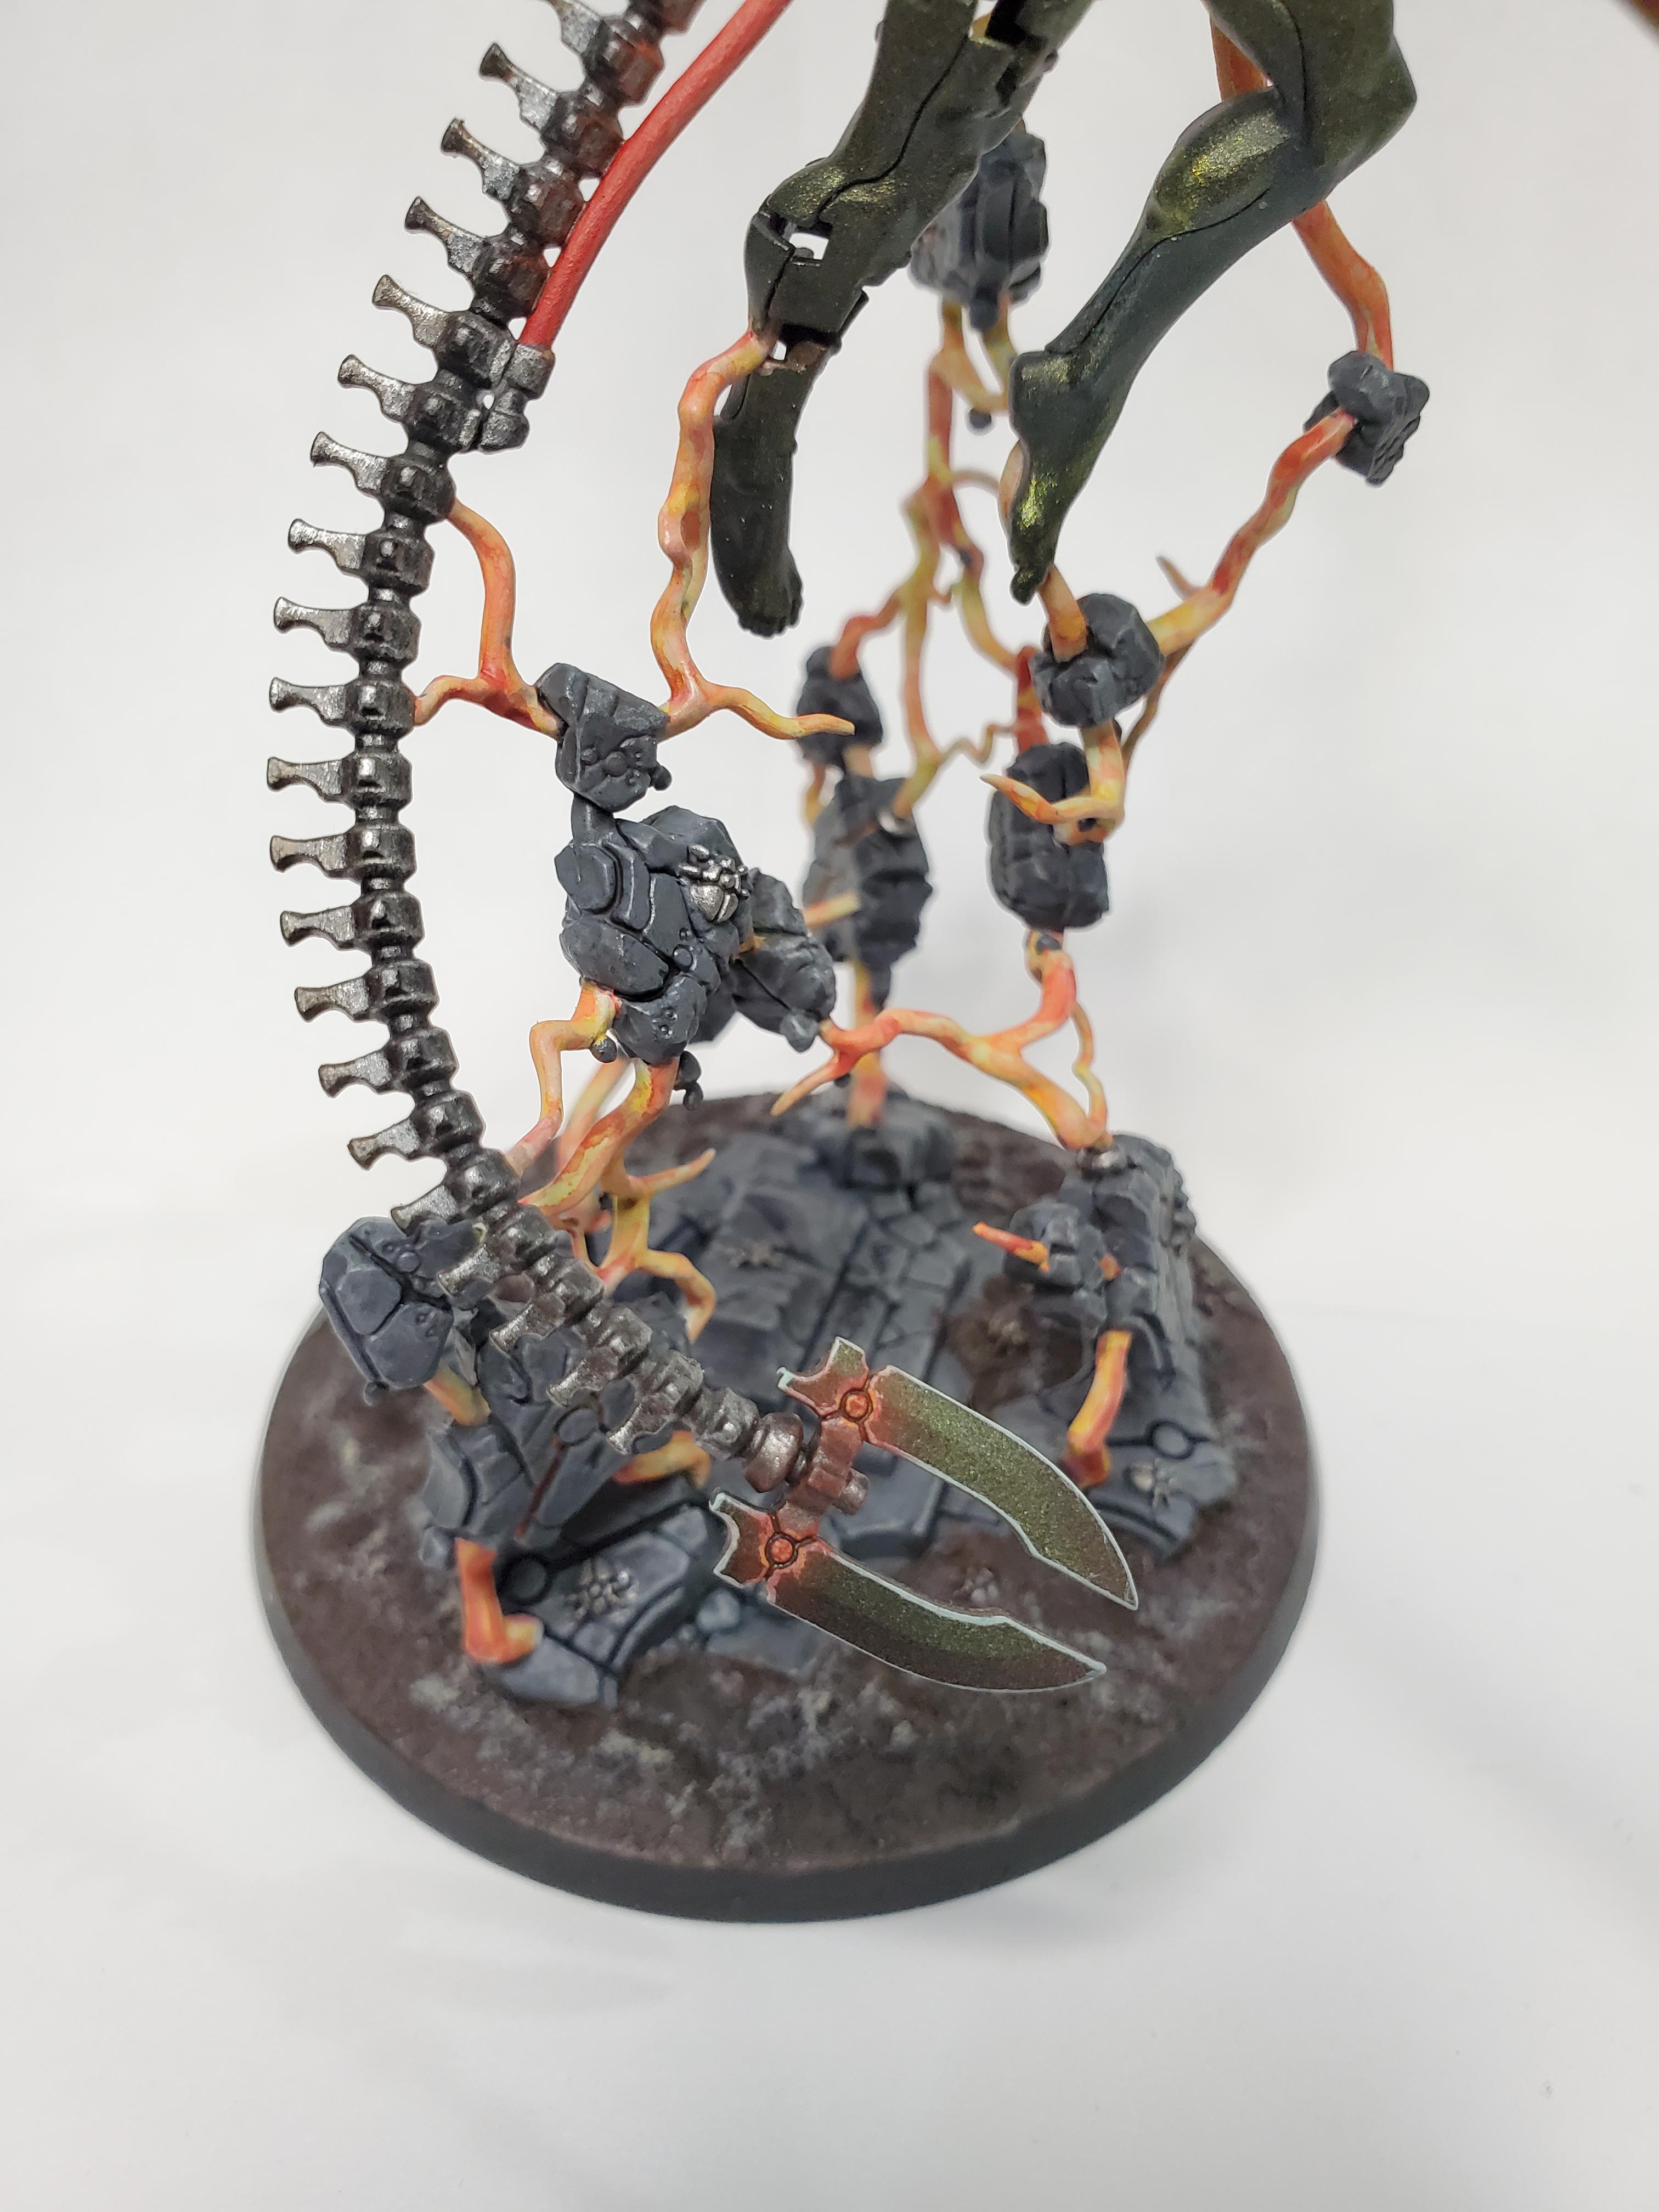 C'tan, C'tan Shard, C'tan Shard Of The Void Dragon, Necrons, Shard Of The Void Dragon, Vd, Void Dragon